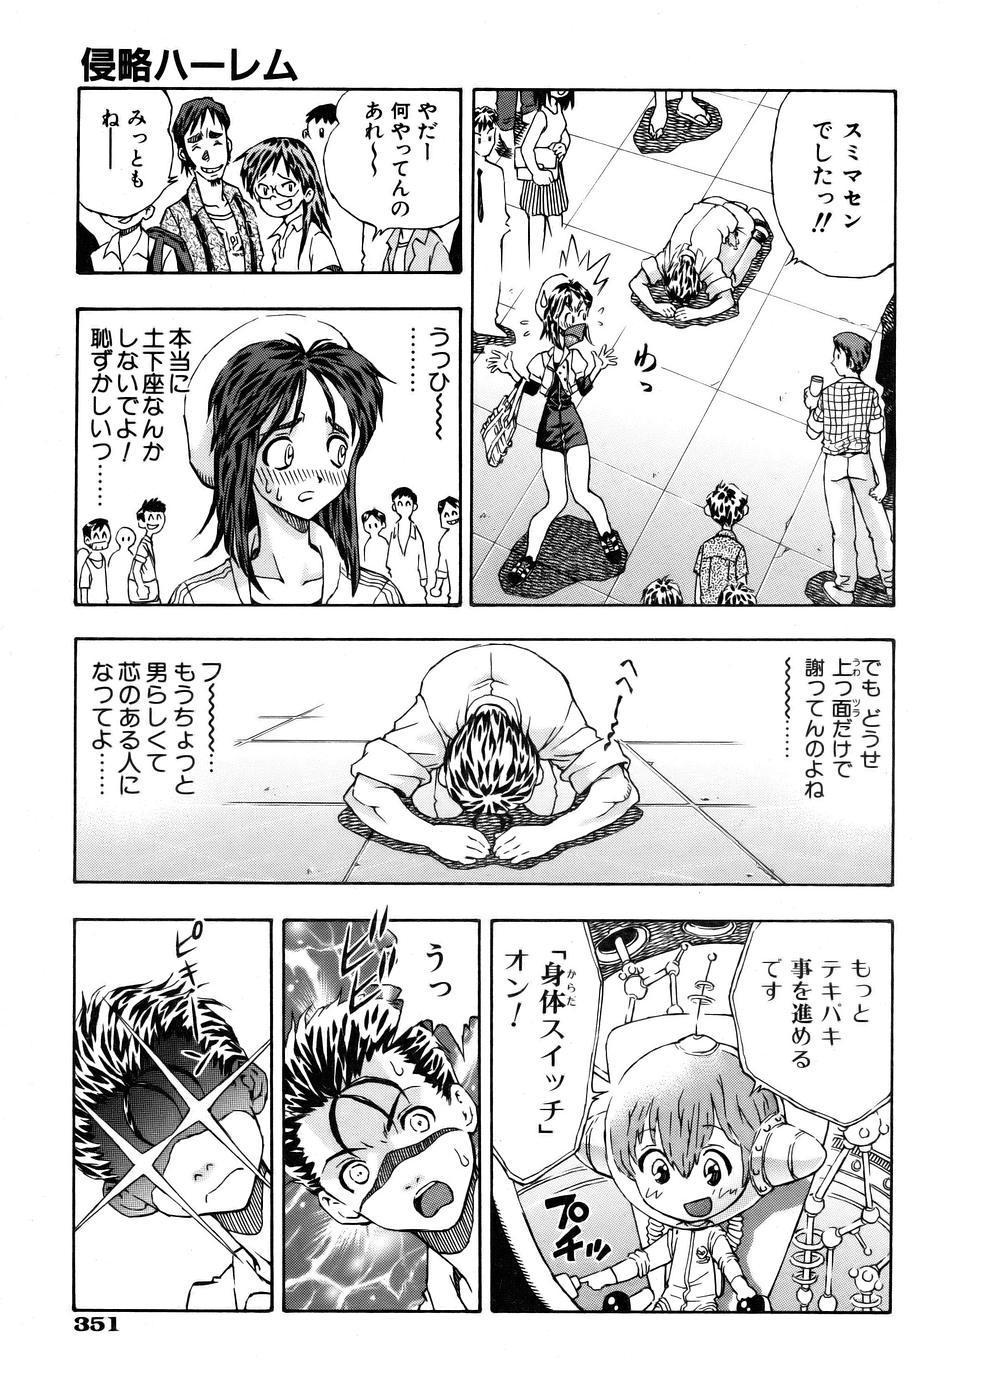 COMIC AUN 2005-10 Vol. 113 348